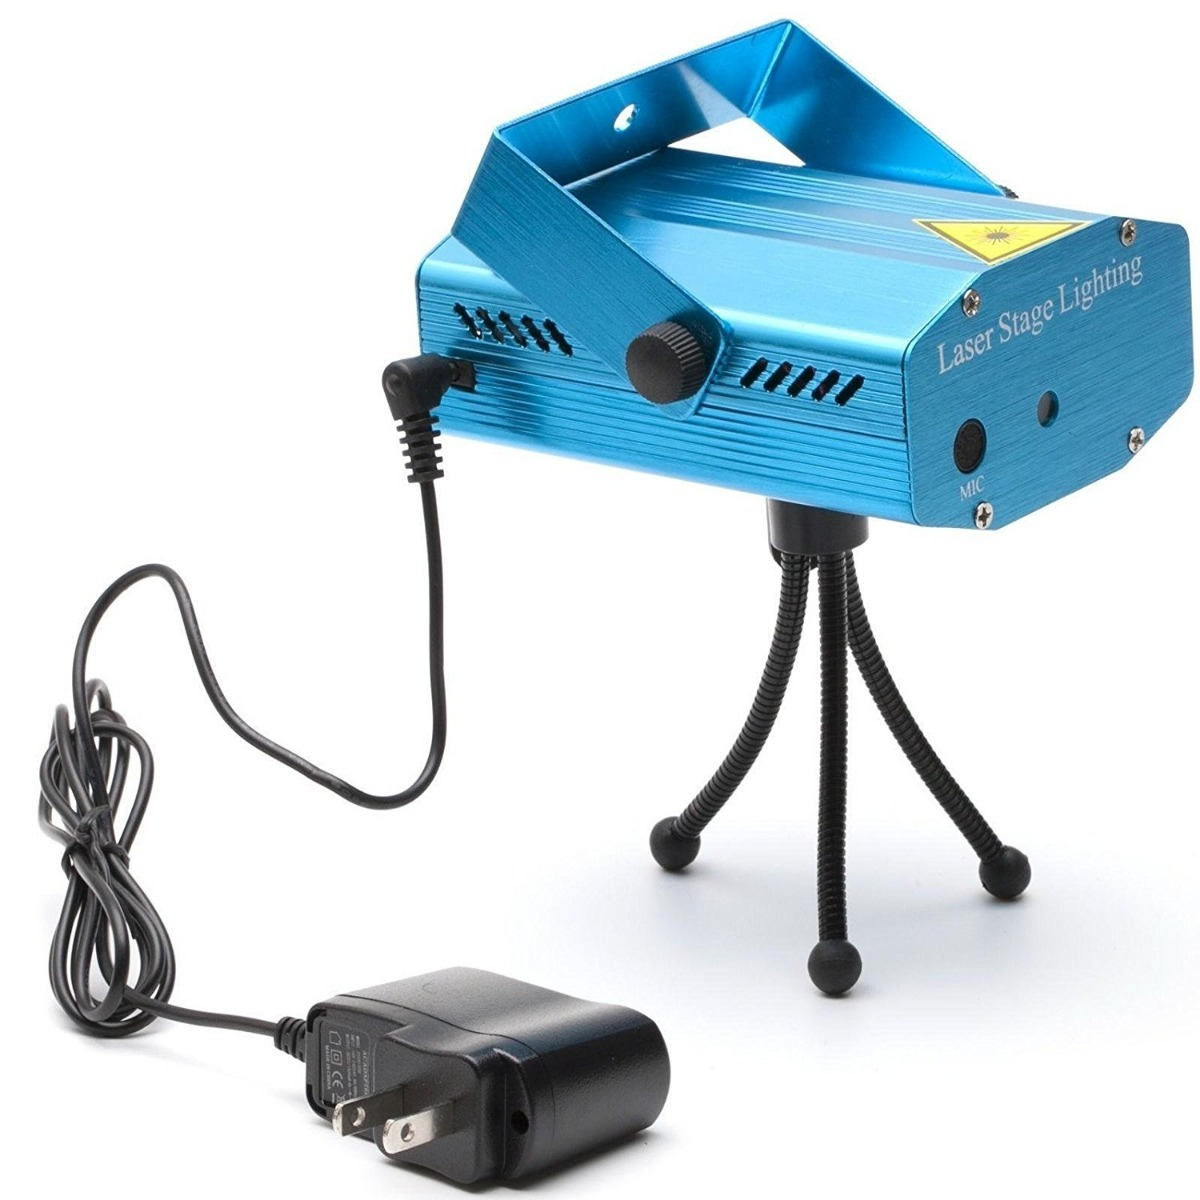 Proyector Luz Laser Multipunto Audioritmico Fiesta Powerzon